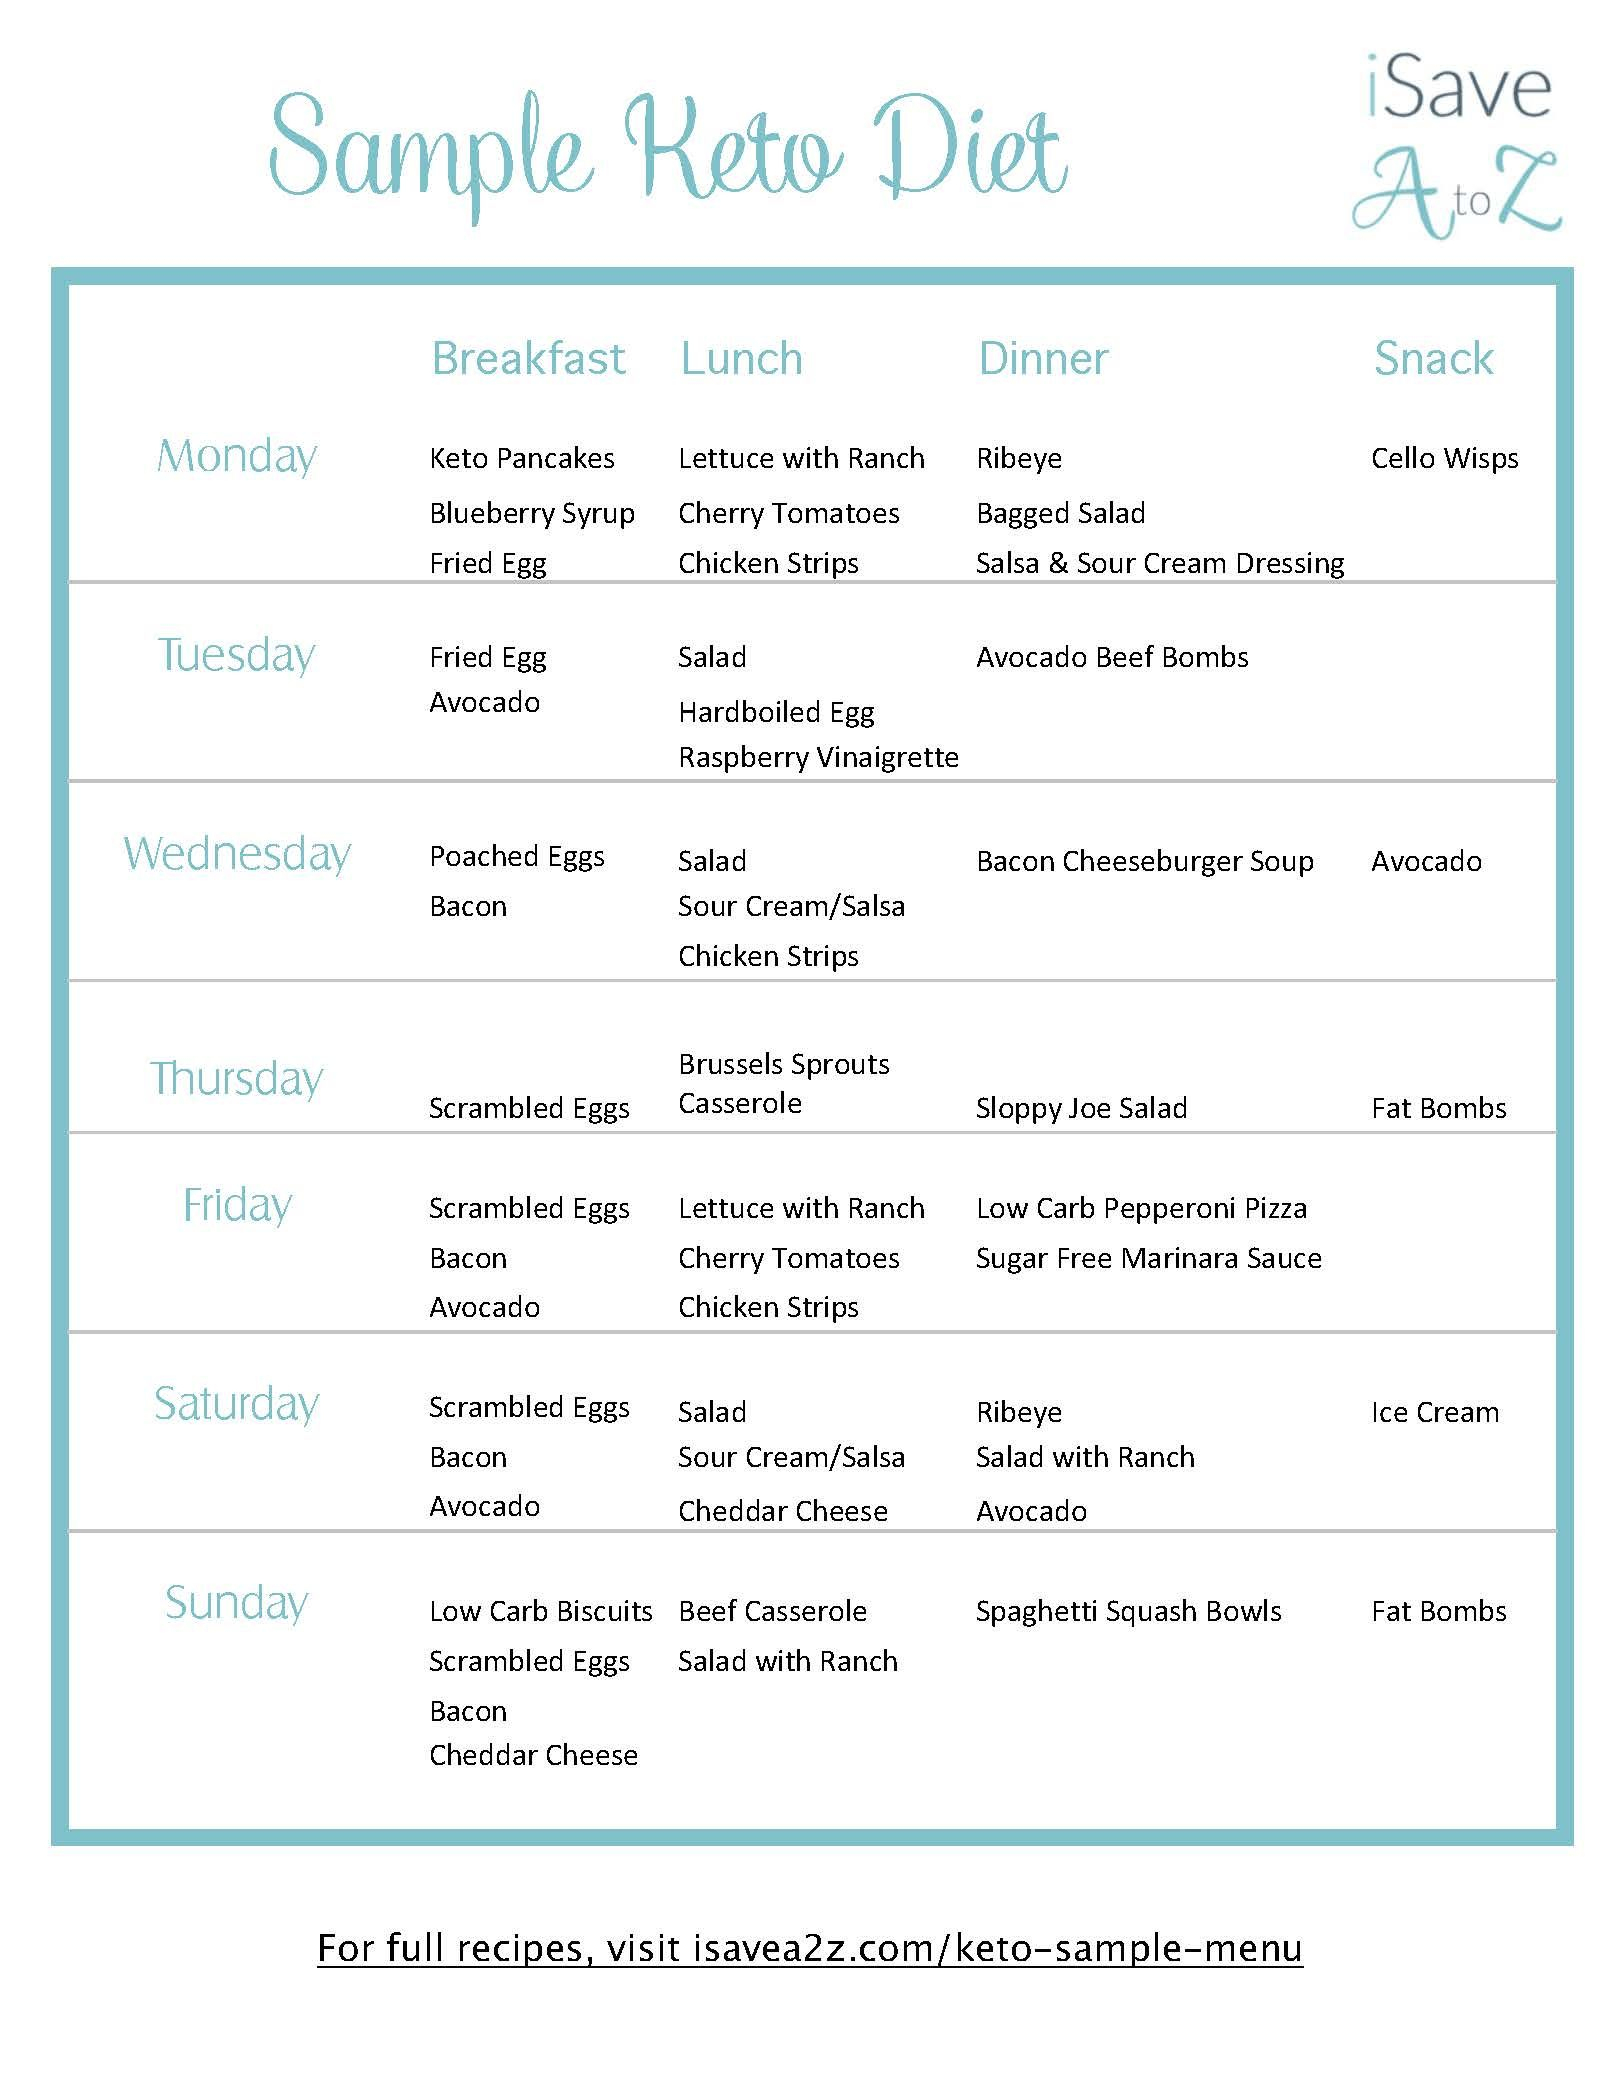 Grab This Printable 7 Day Keto Sample Menu Plan | Recipes - Free Printable Atkins Diet Plan